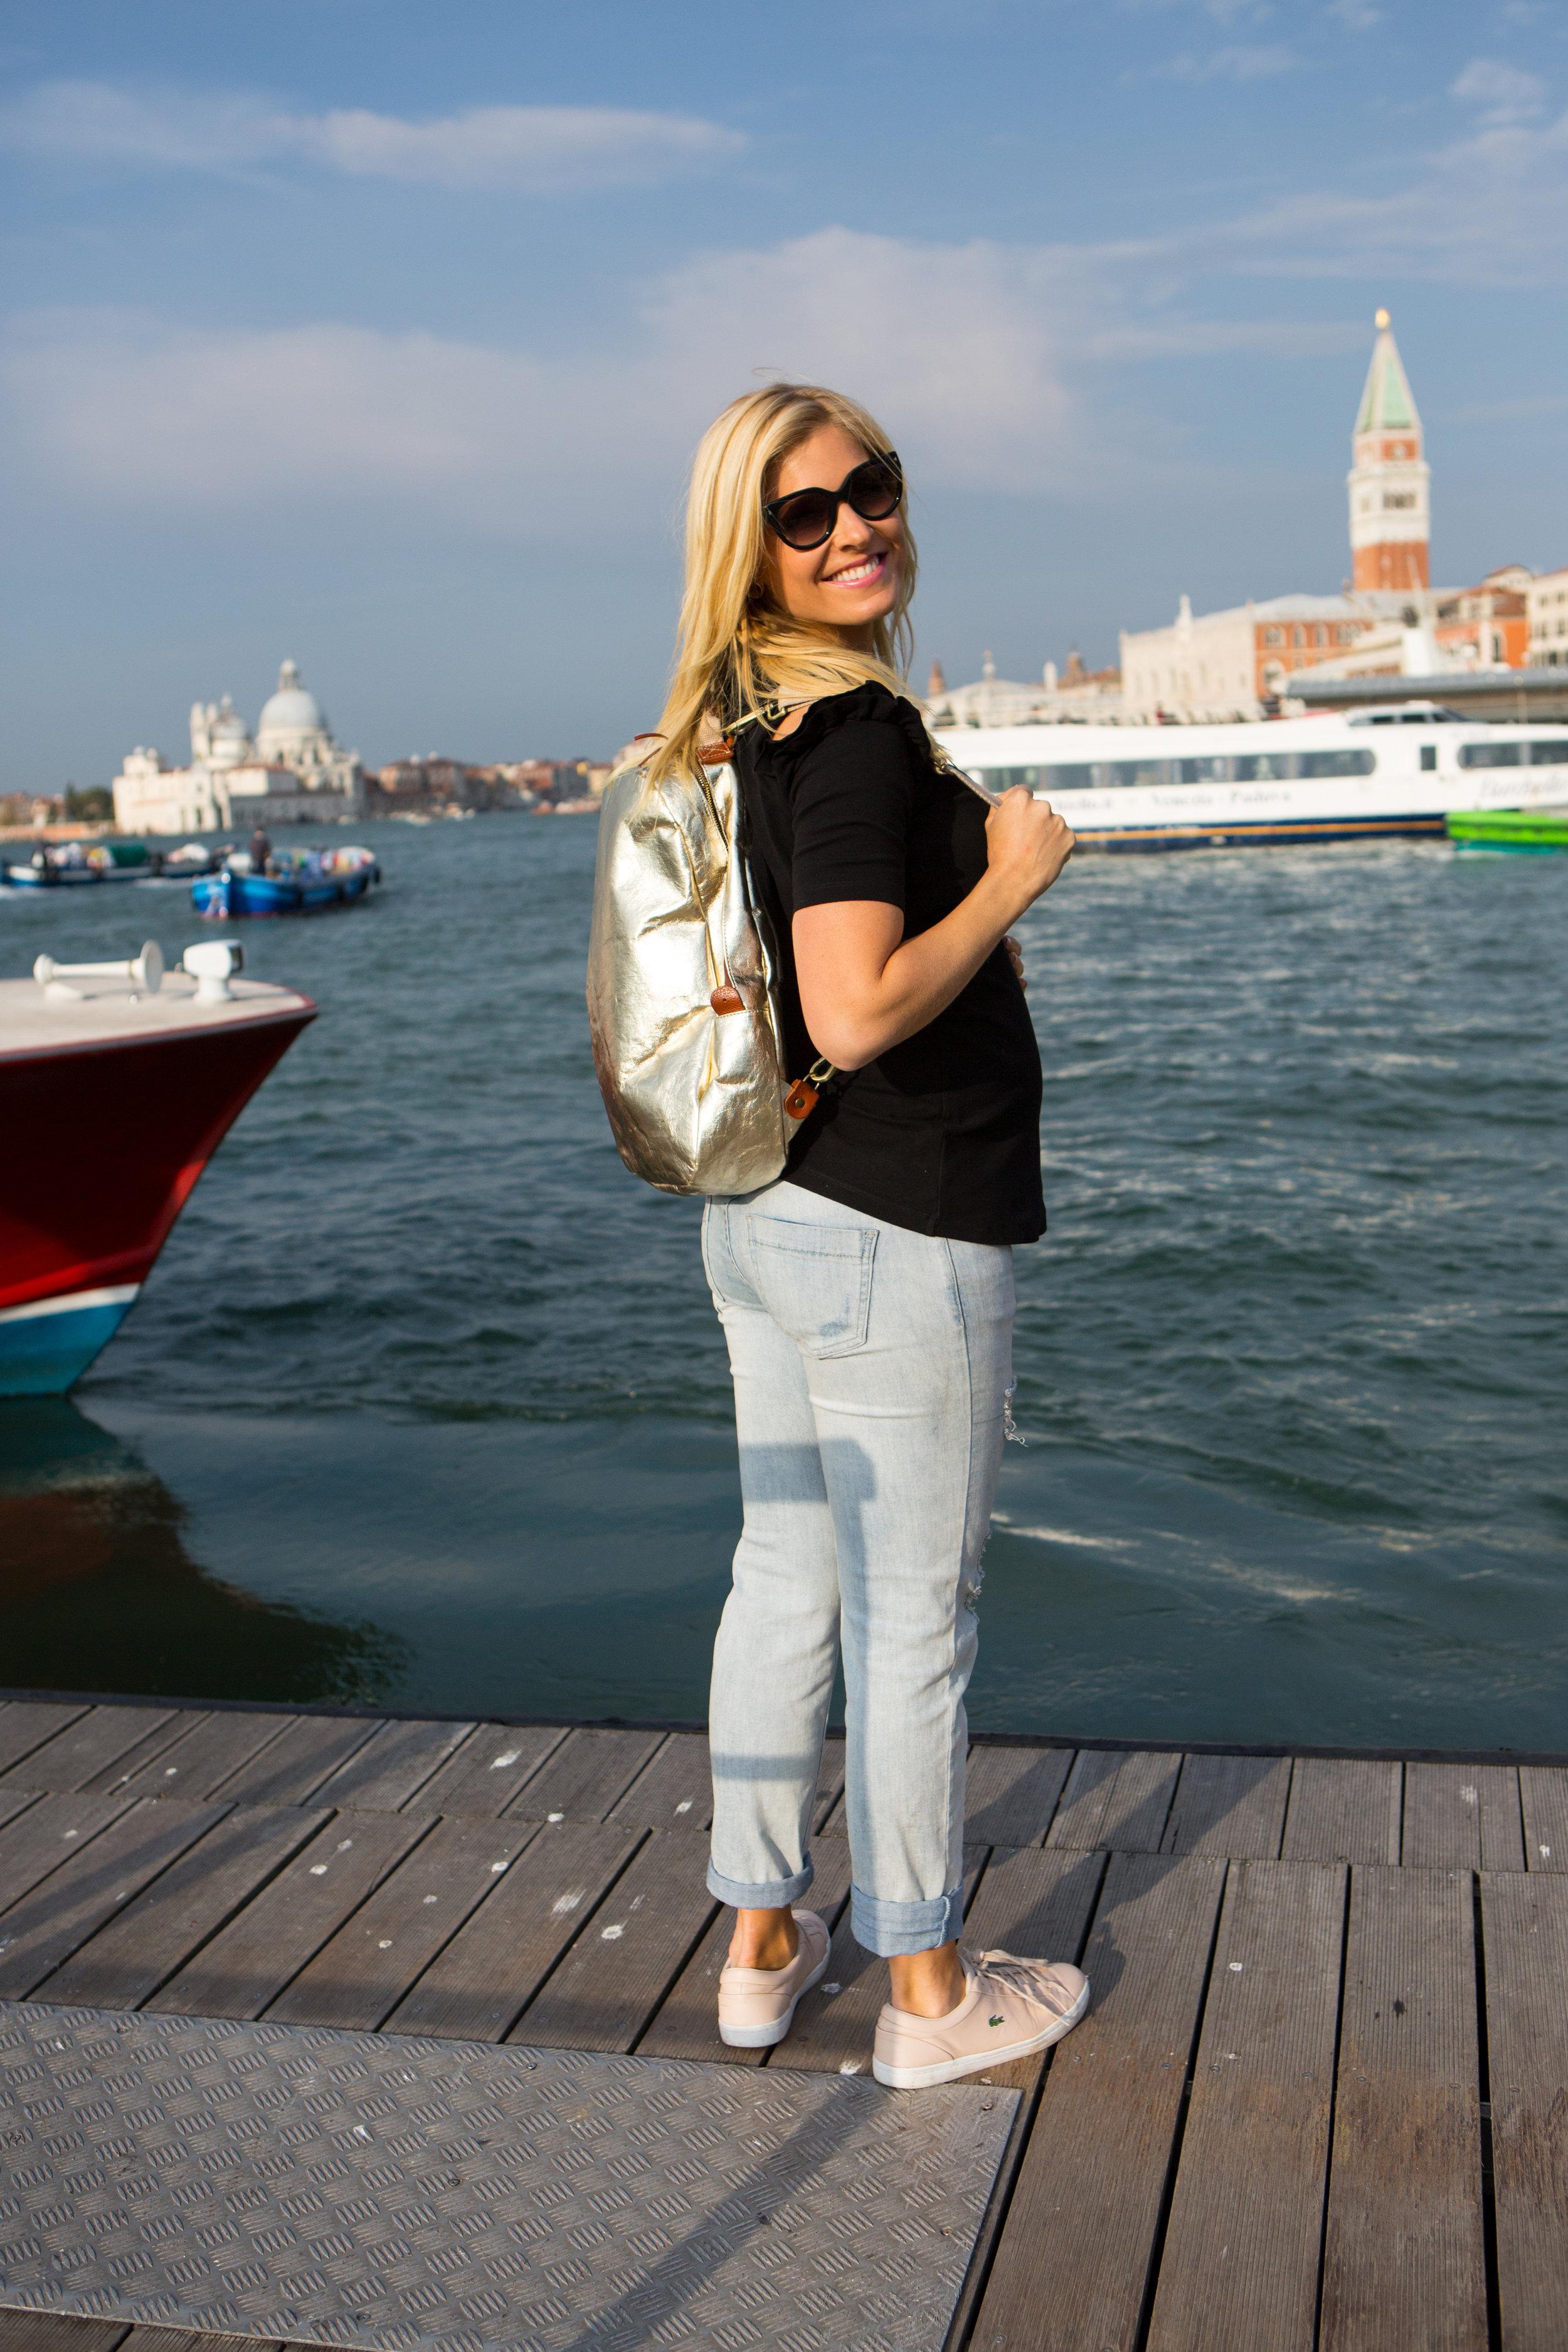 Photo Cred: Anna Kooiman, Venice, Italy, Michele Agostinis